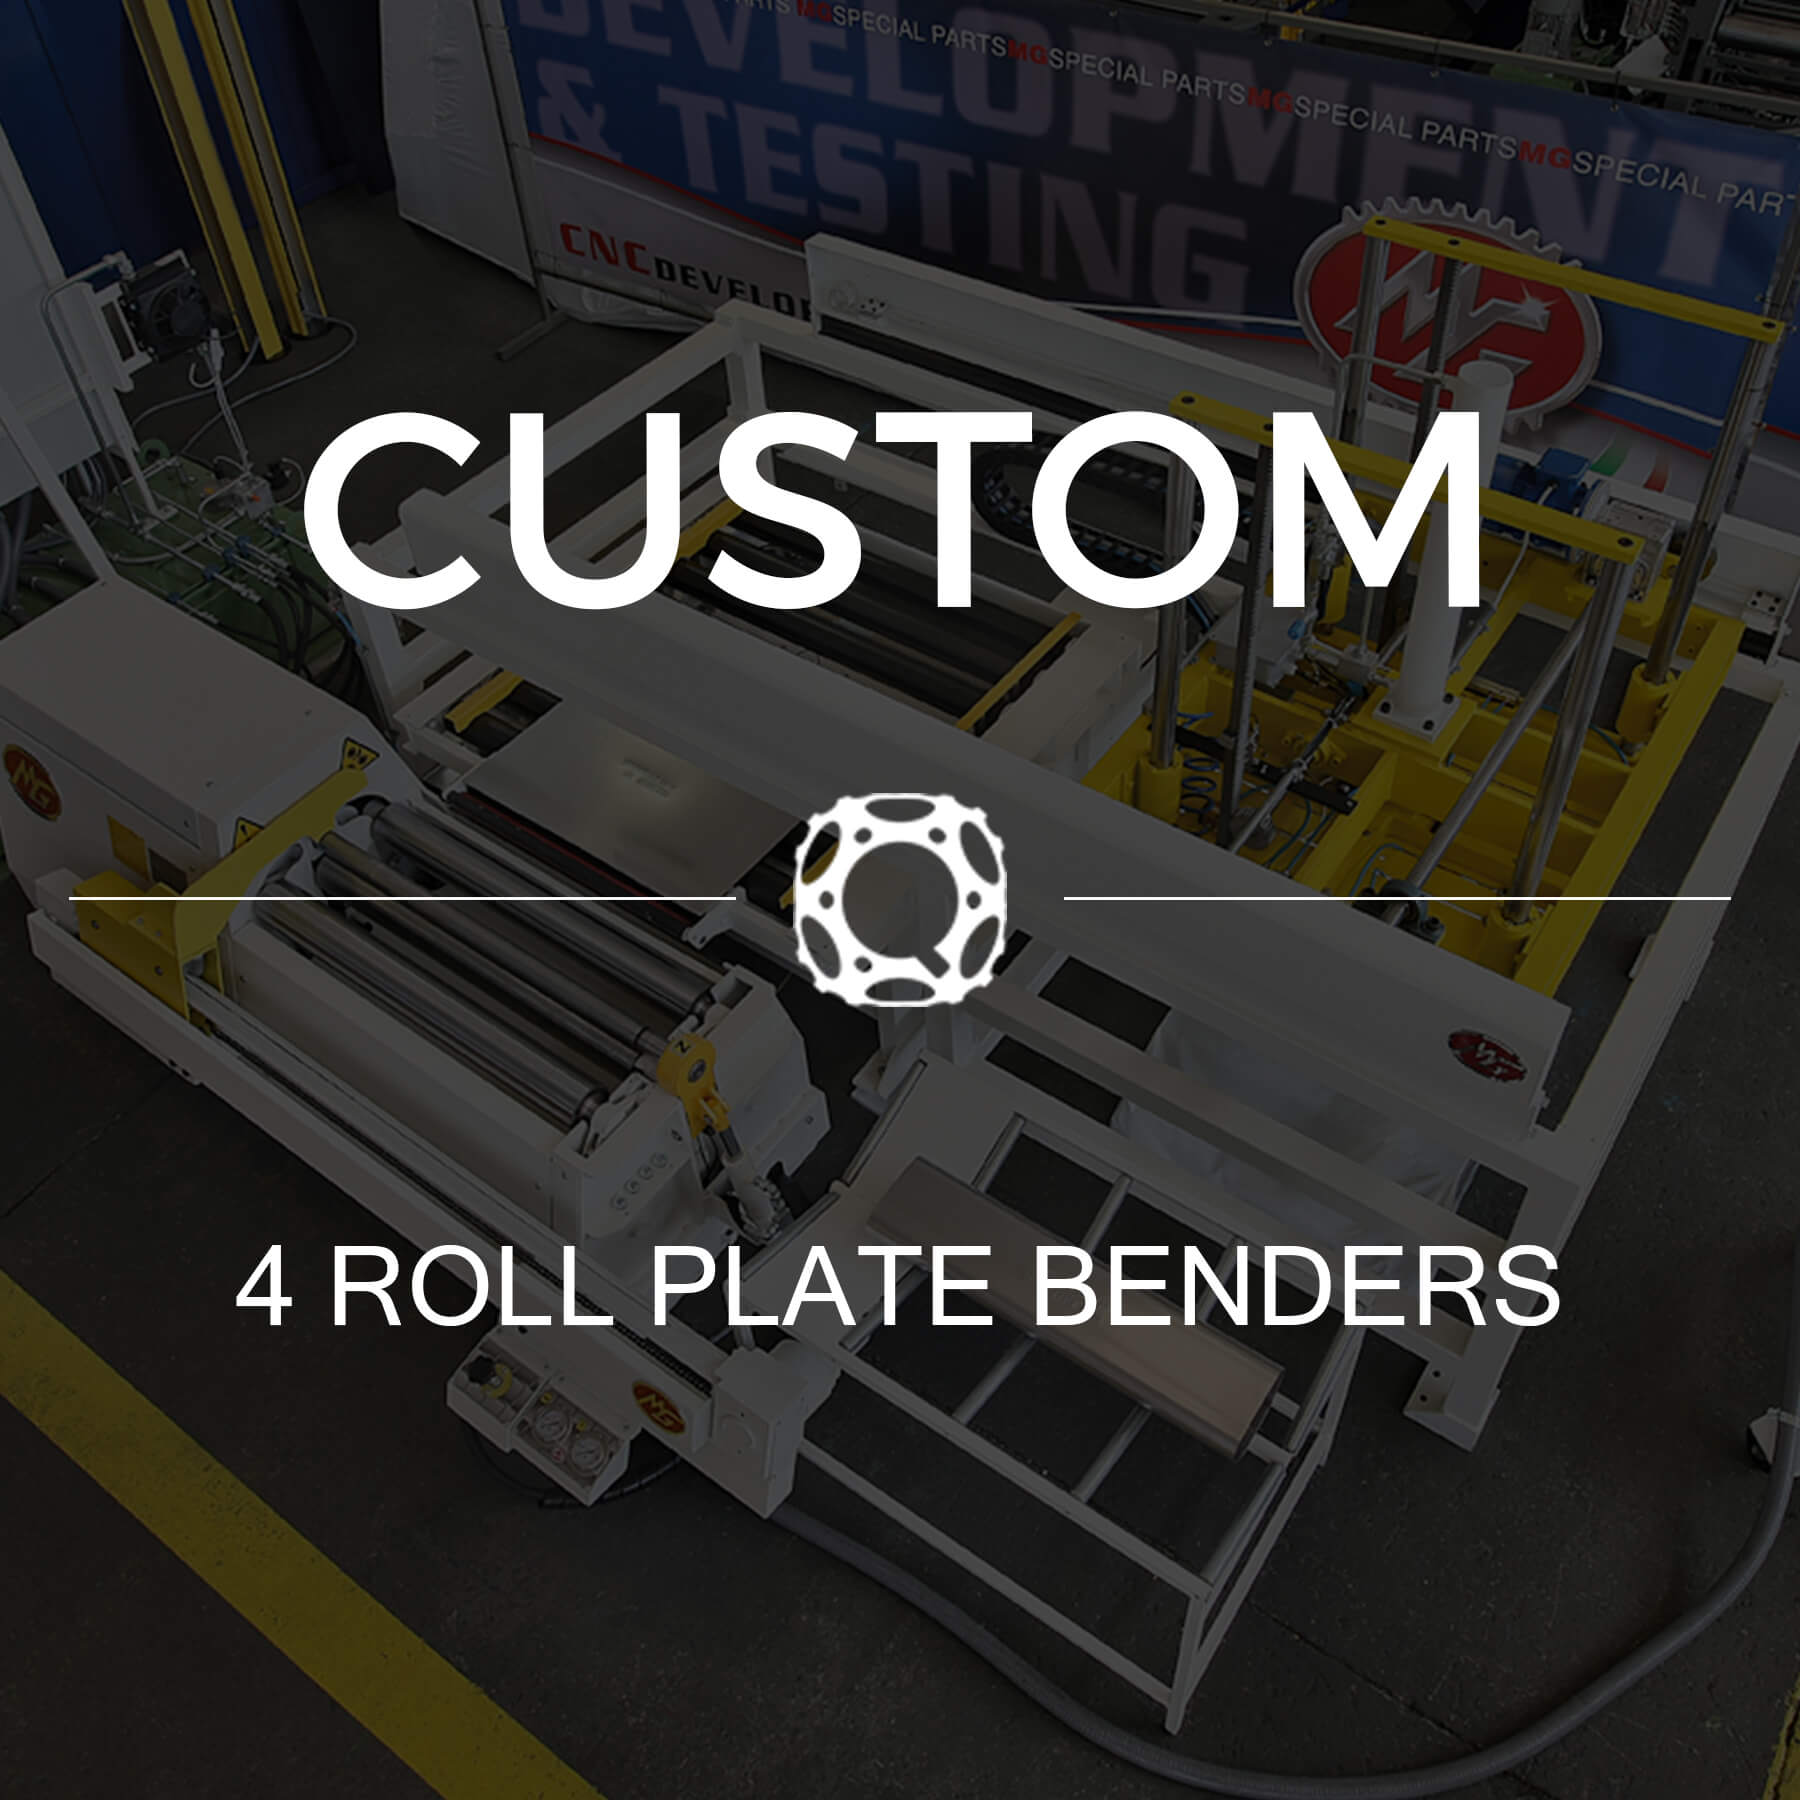 https://www.platebenders.com/4-rolls-working-lengths/custom-4-roll-plate-benders